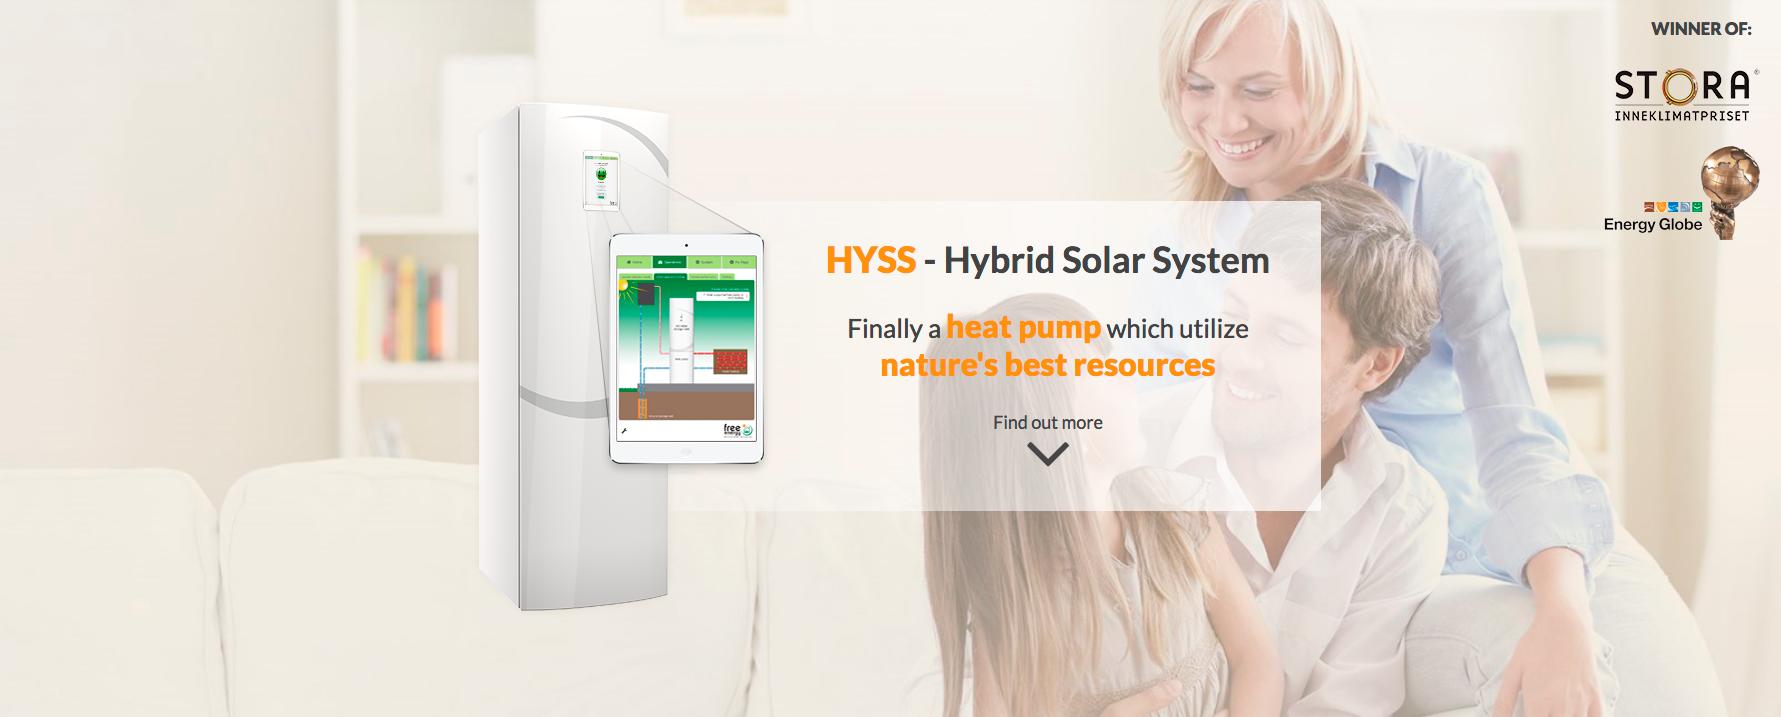 Gallery Hybrid Solar System 4